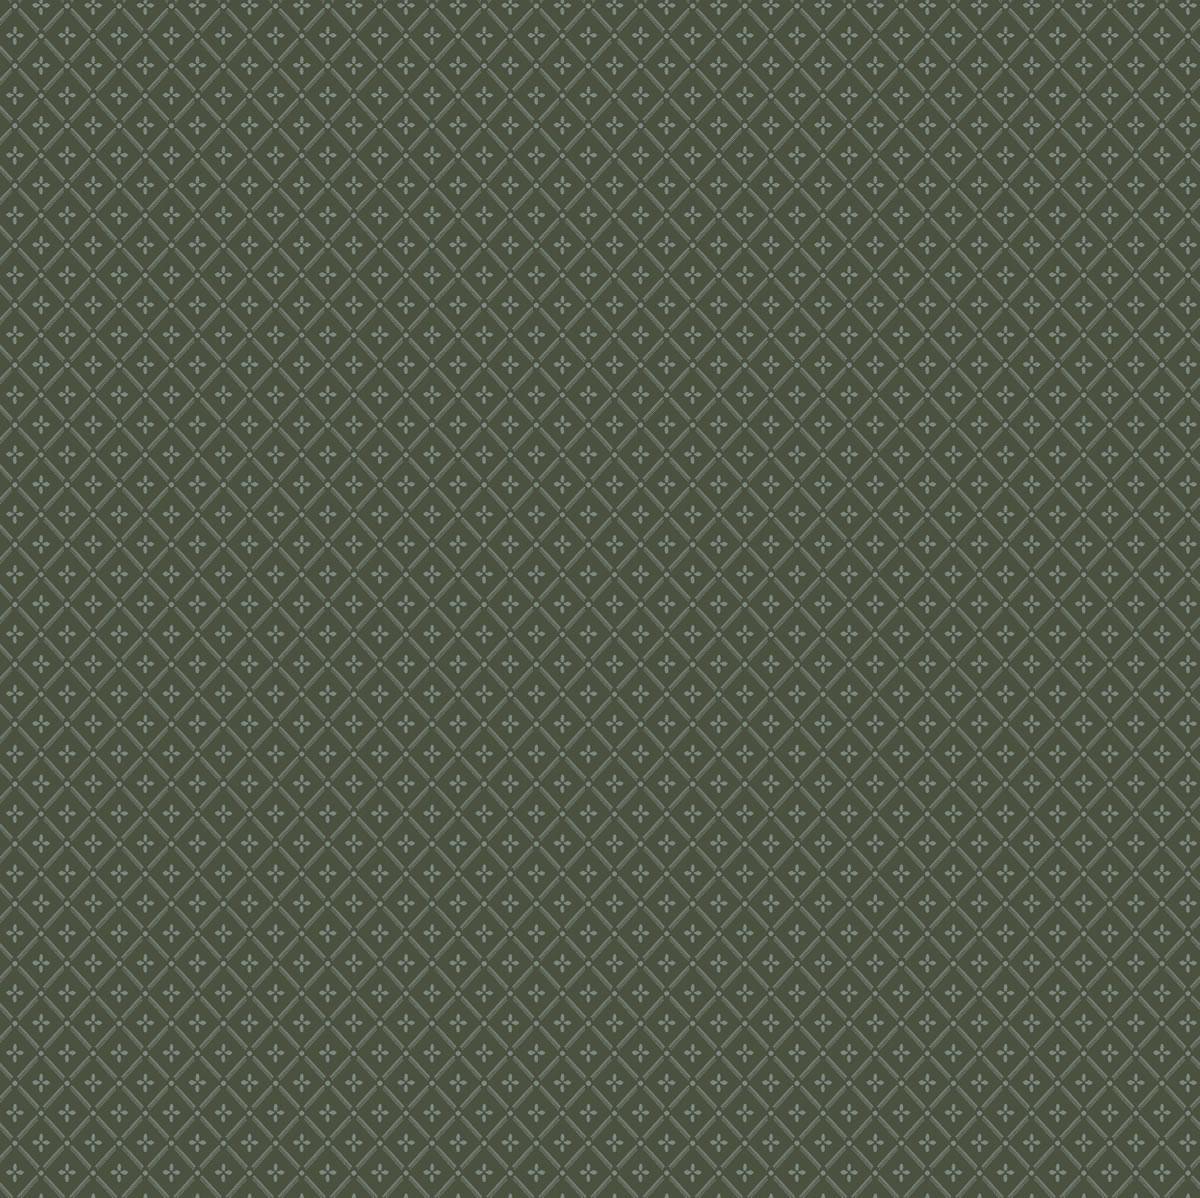 Papel de Parede Mido Mosaico 105046 - Rolo: 10m x 0,53m